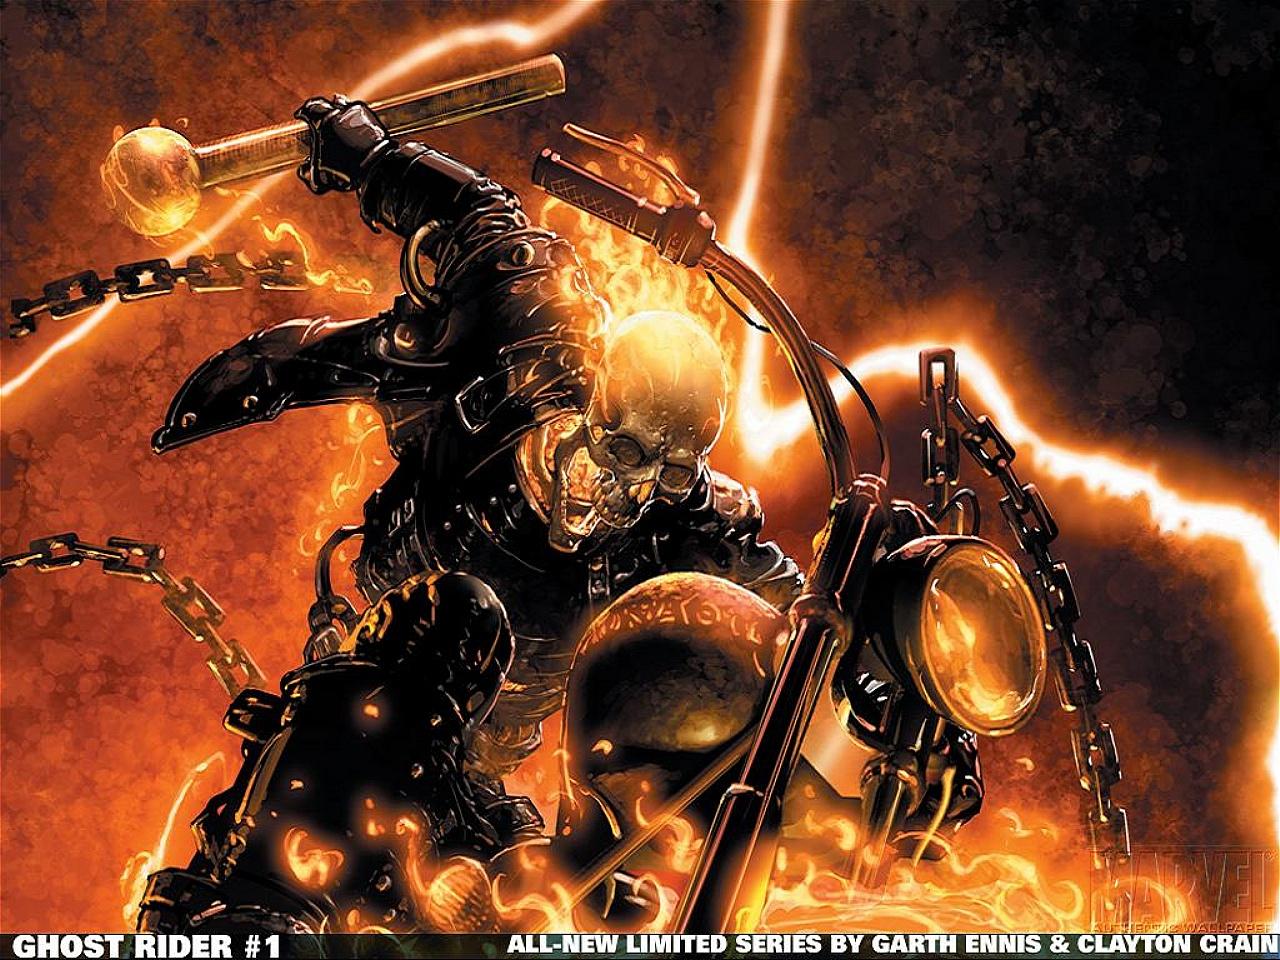 [48+] Ghost Rider 2 Wallpapers on WallpaperSafari